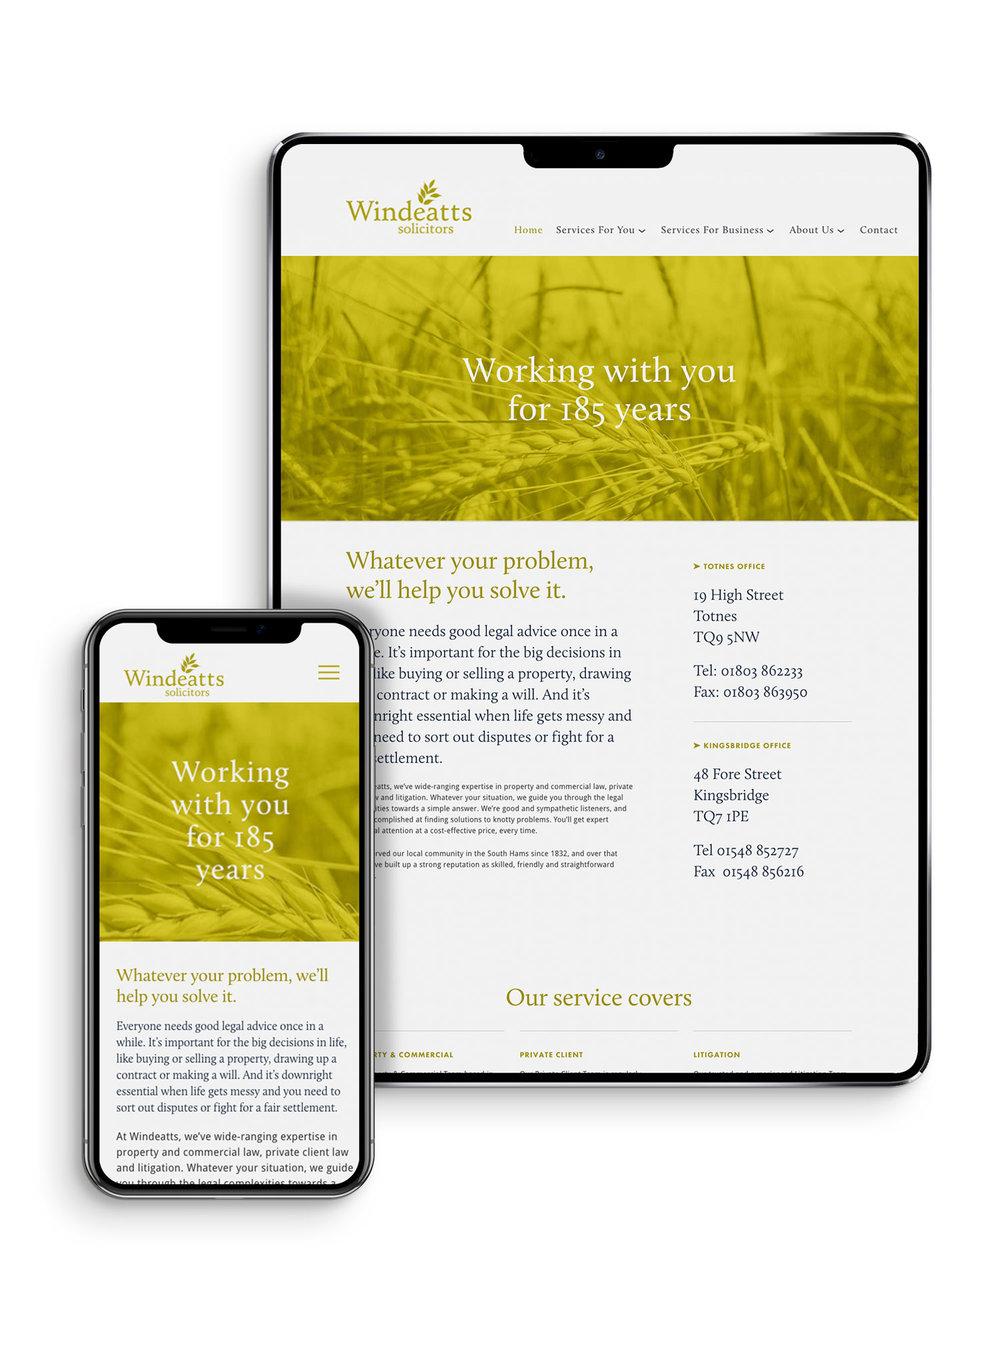 Ipad-windeatts-website-totnes